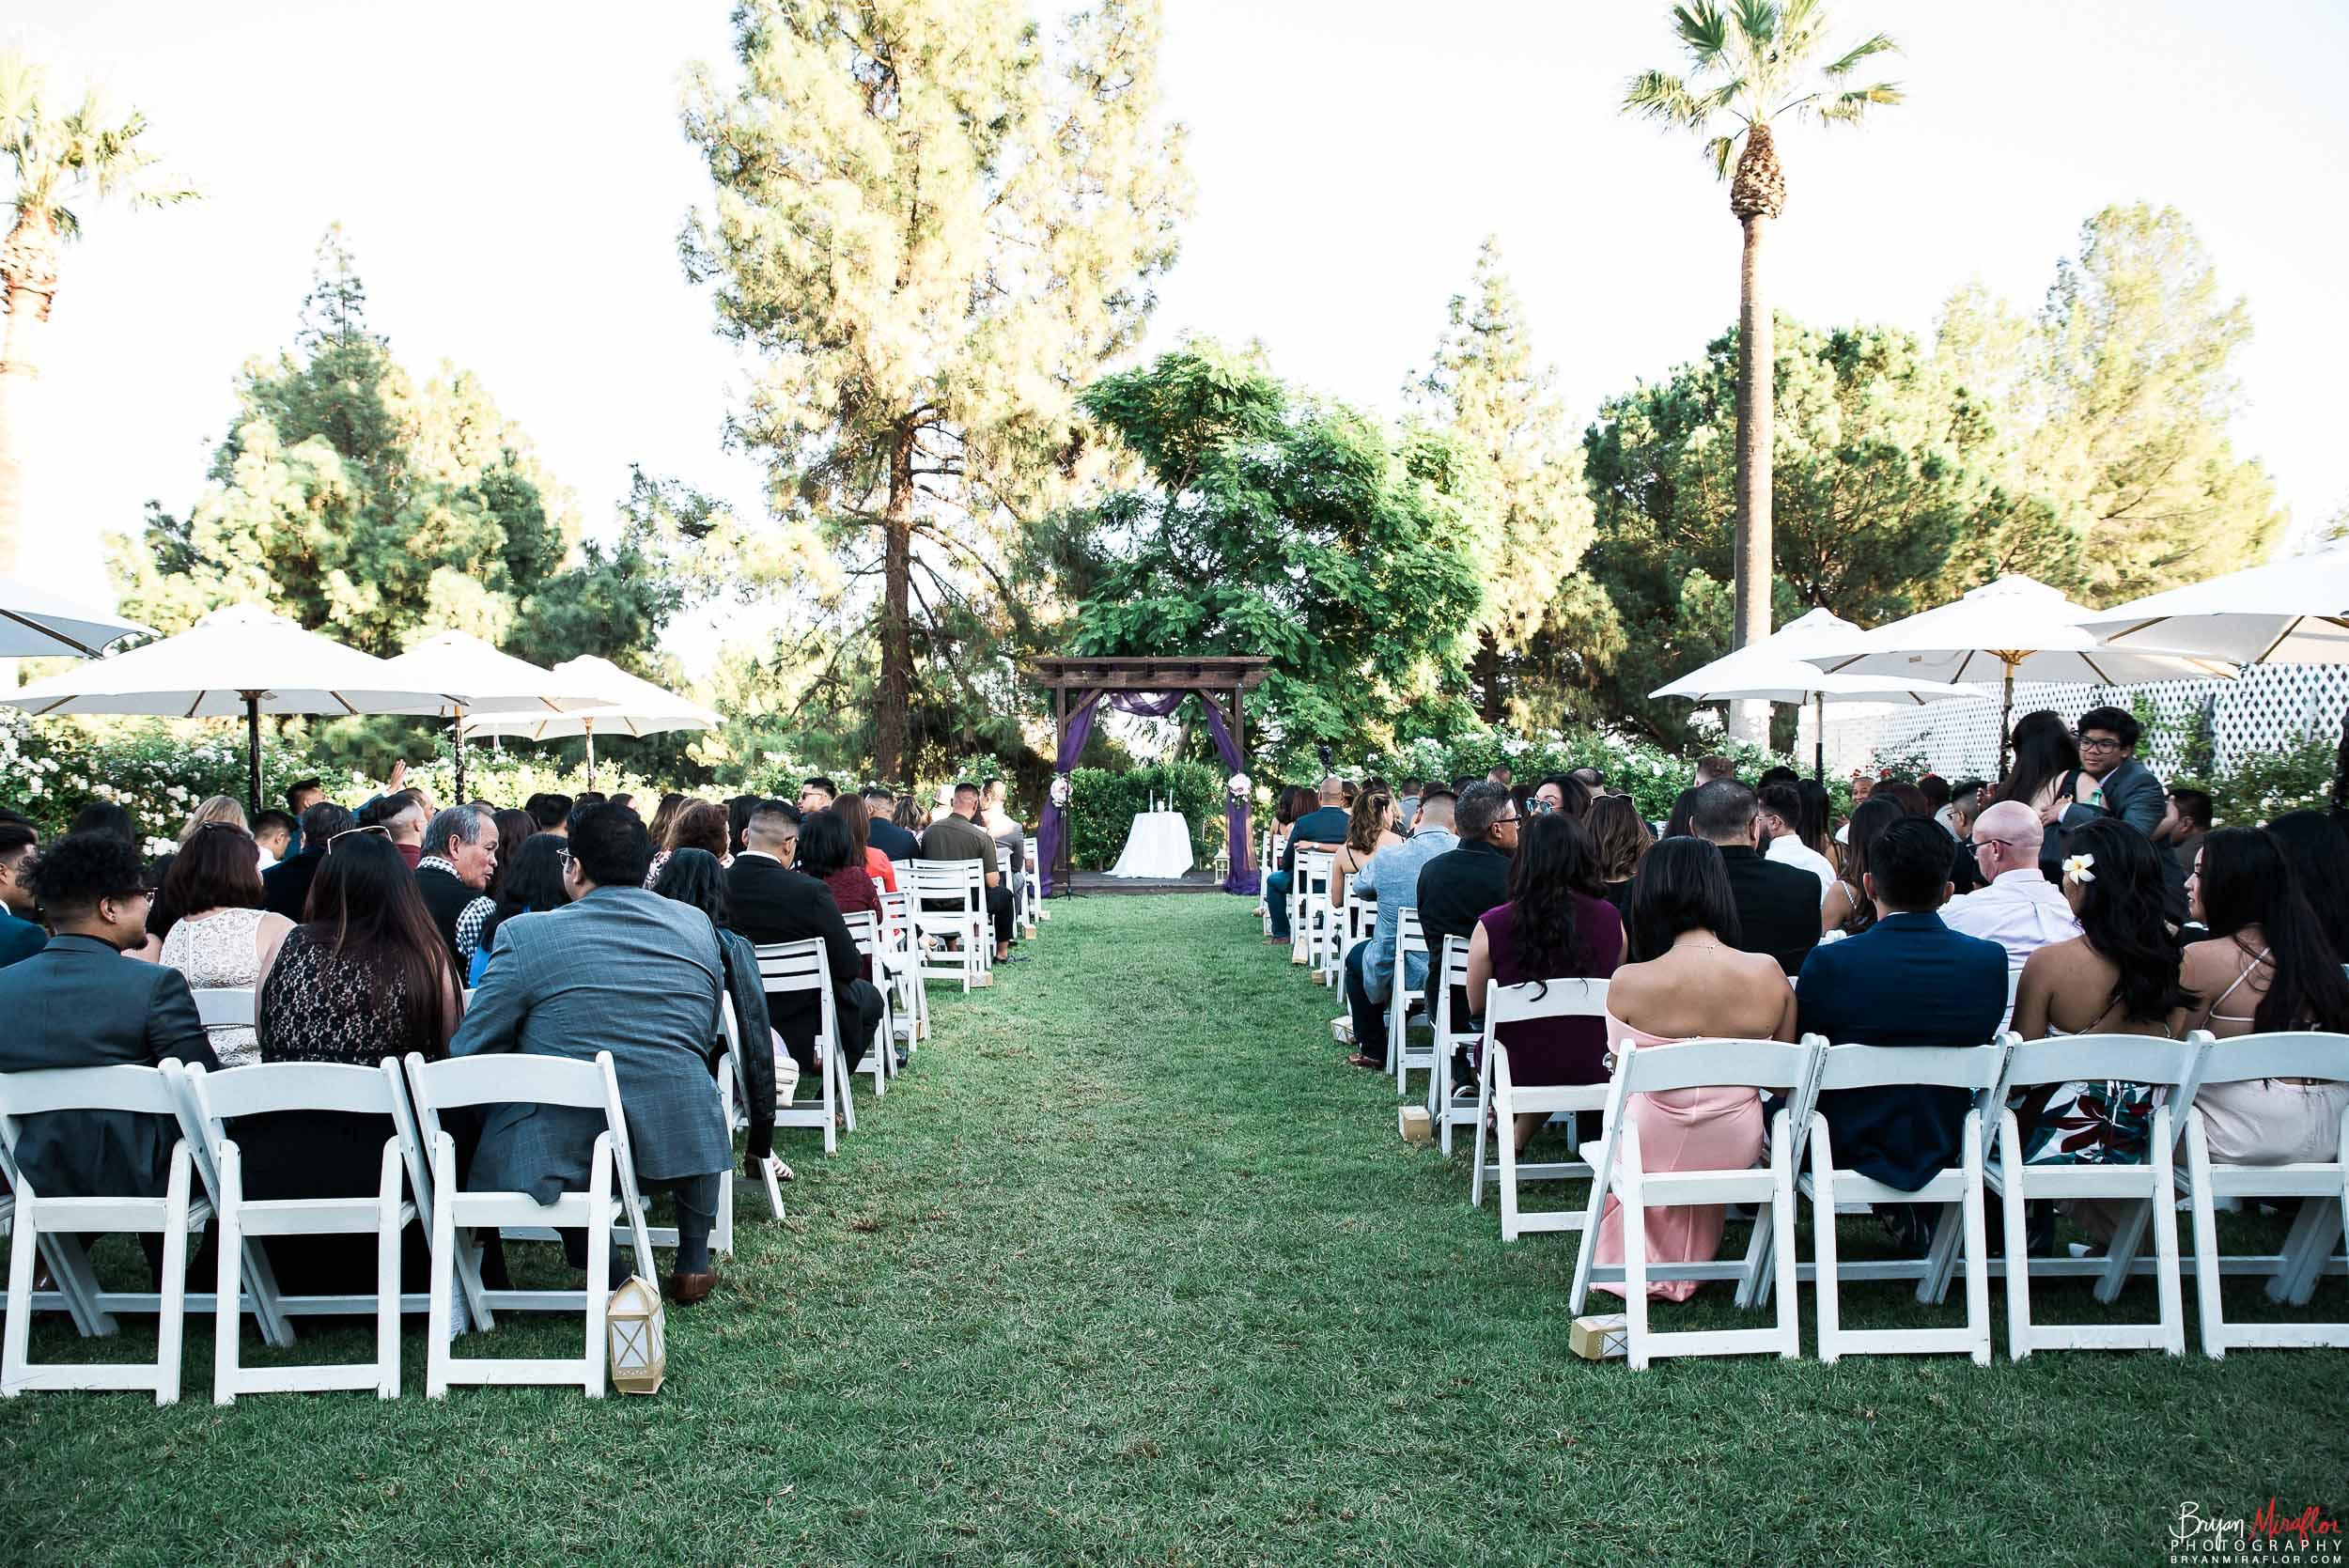 Bryan-Miraflor-Photography-Trisha-Dexter-Married-20170923-050.jpg